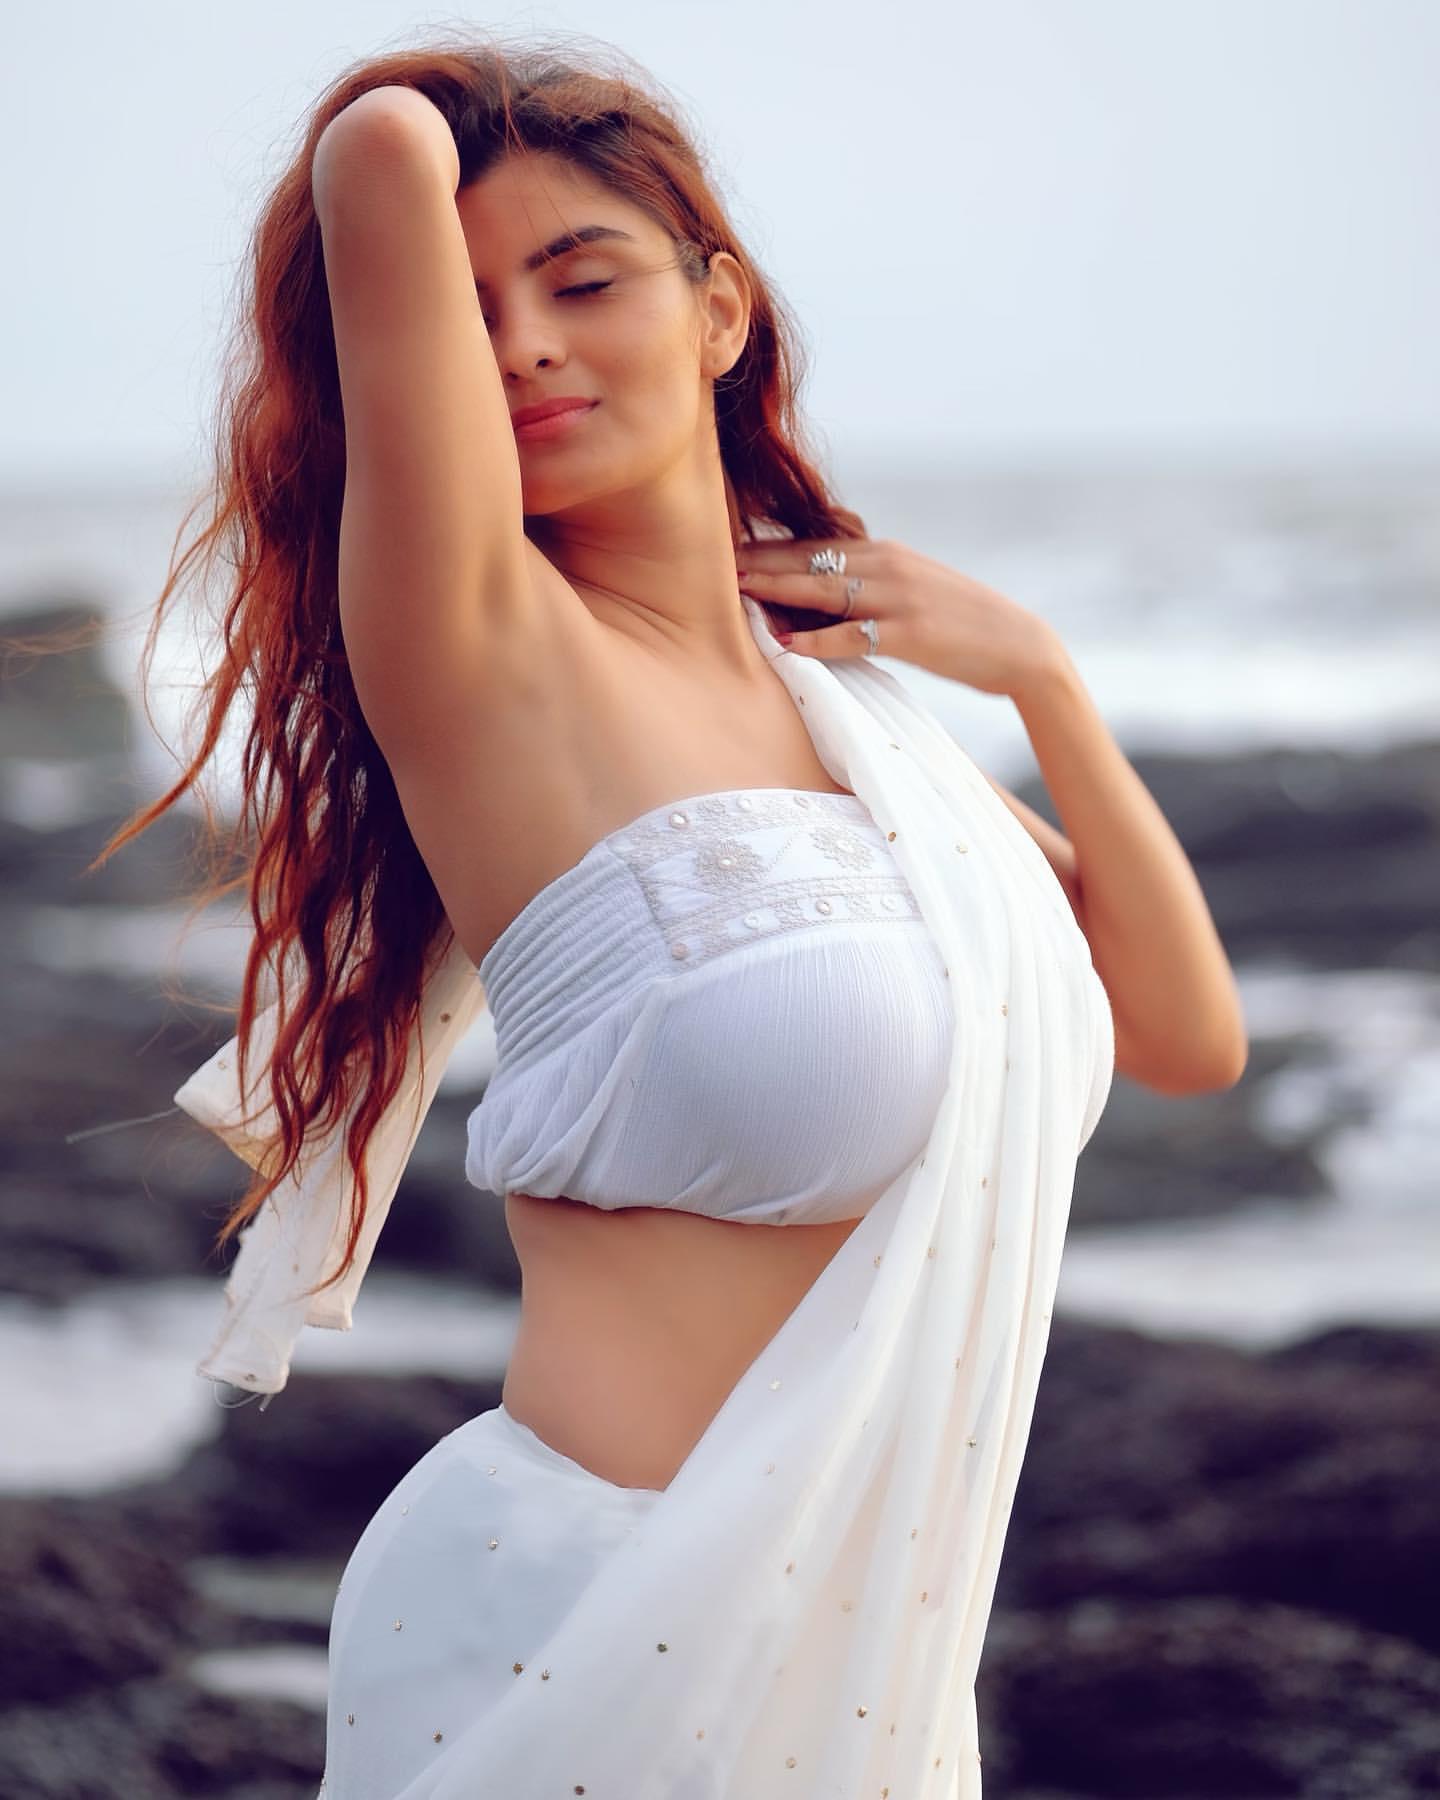 Anveshi Jain : అందాల పూదోట అన్వేషి పరువాలకు ఫిదా అవ్వాల్సిందే.. Instagram